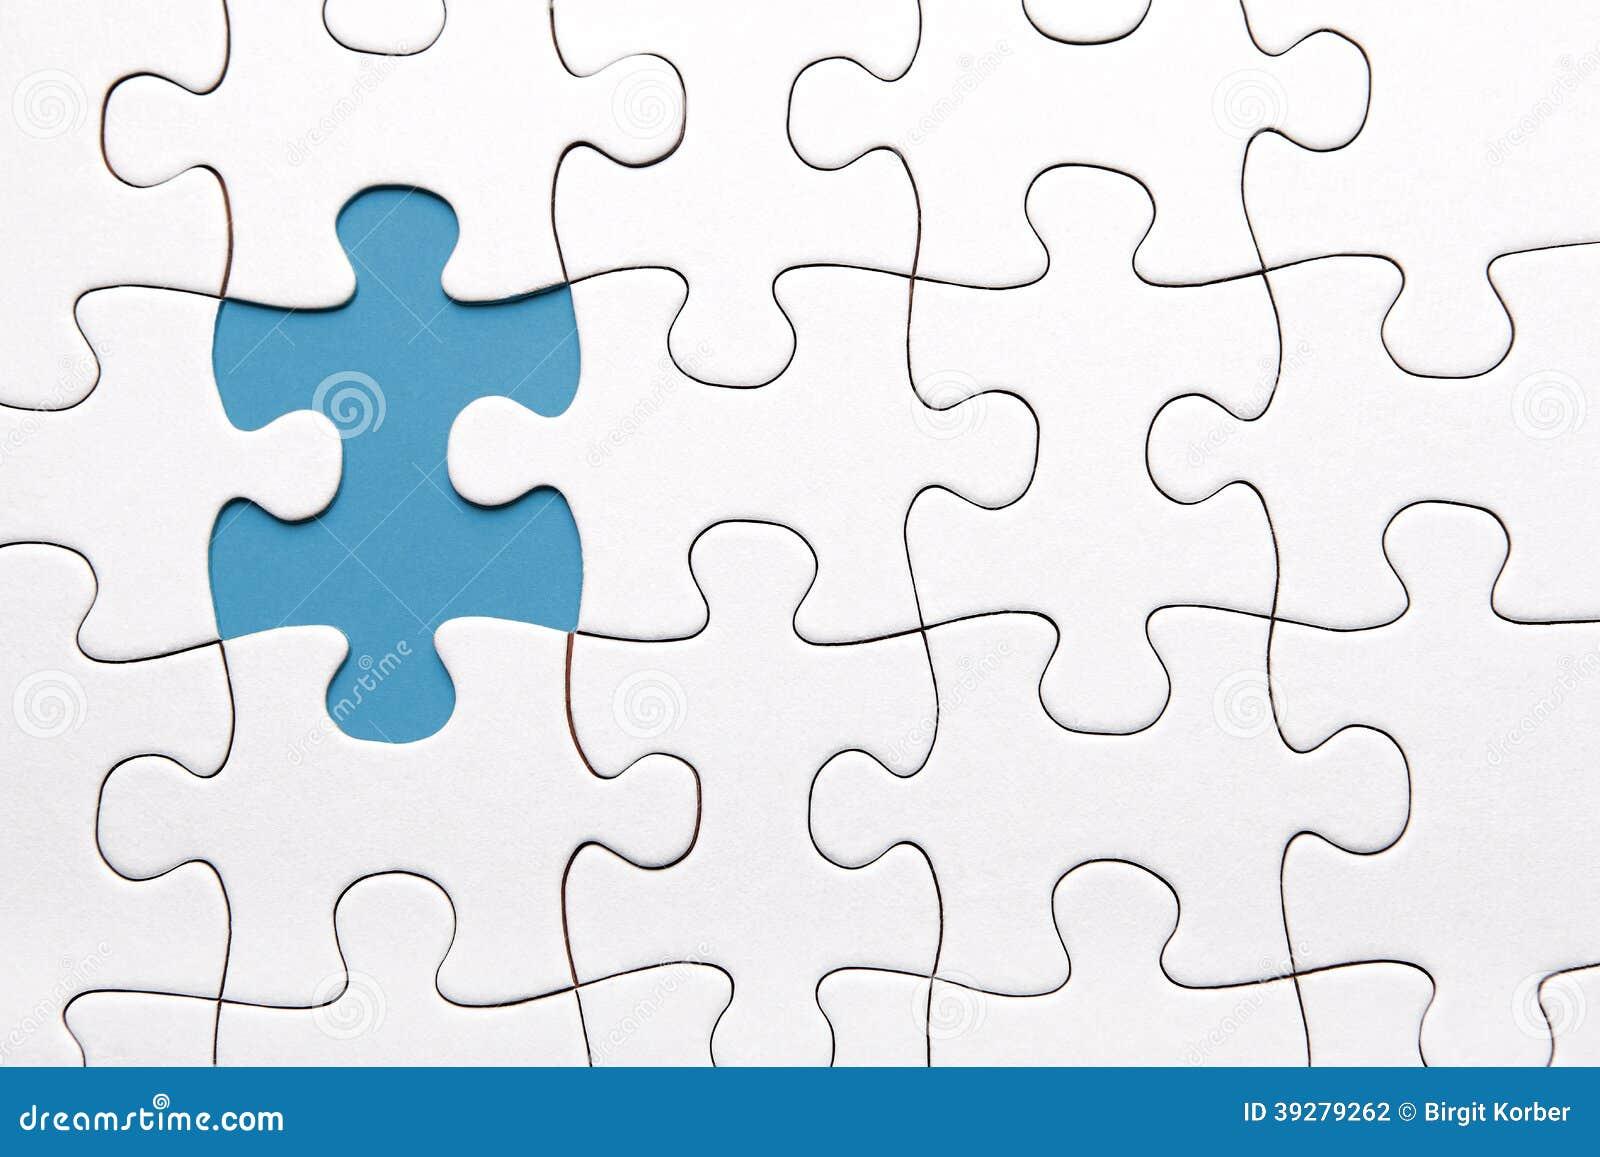 Blue Puzzle Piece Missing Stock Photo - Image: 39279262